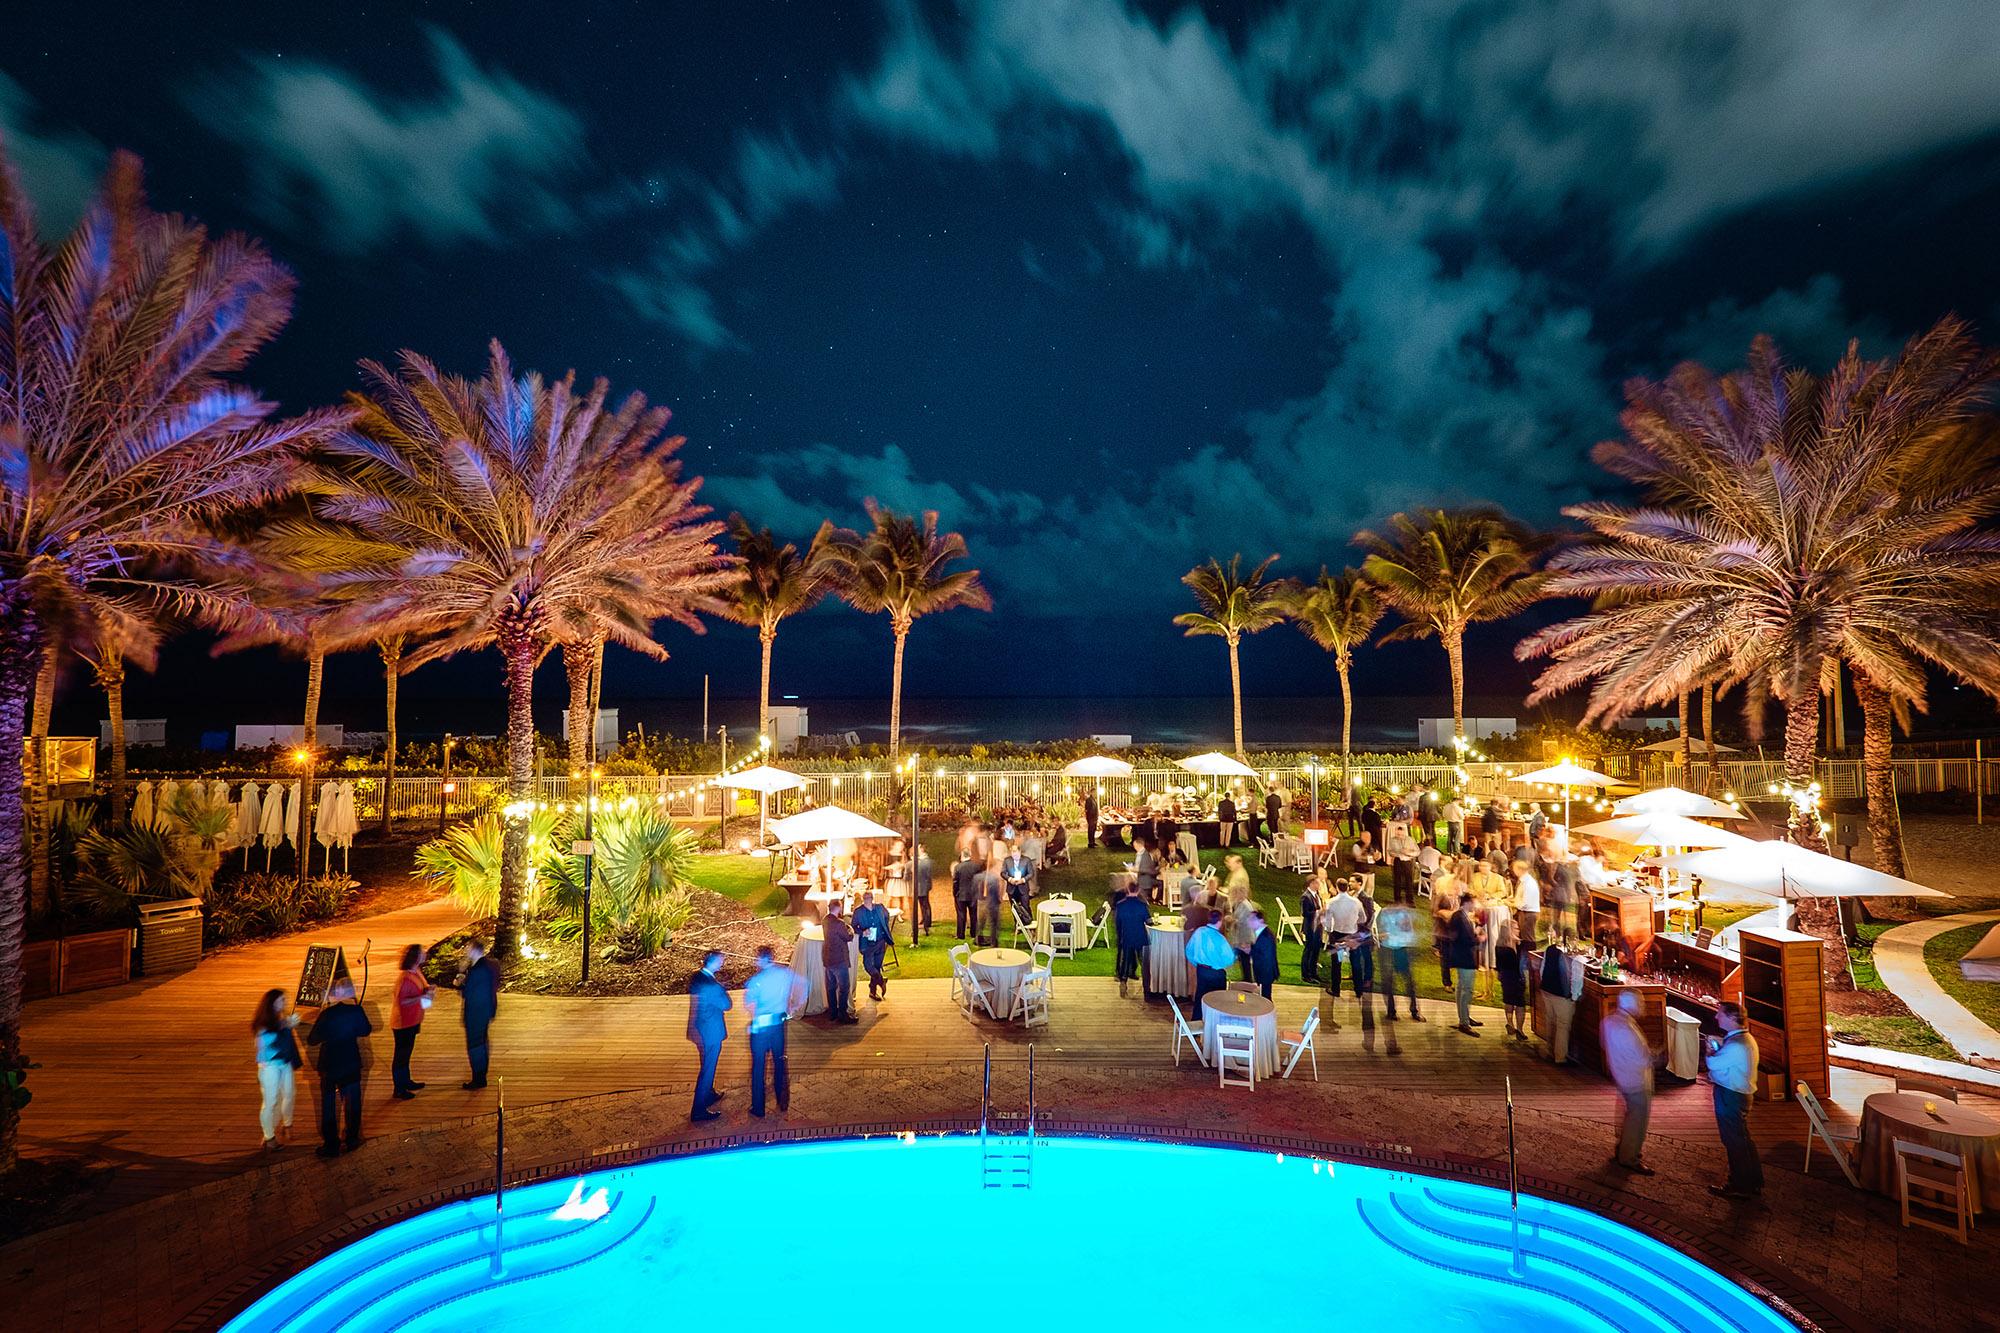 Corporate Event photographer Richard Hadley at the Eden Roc in Miami